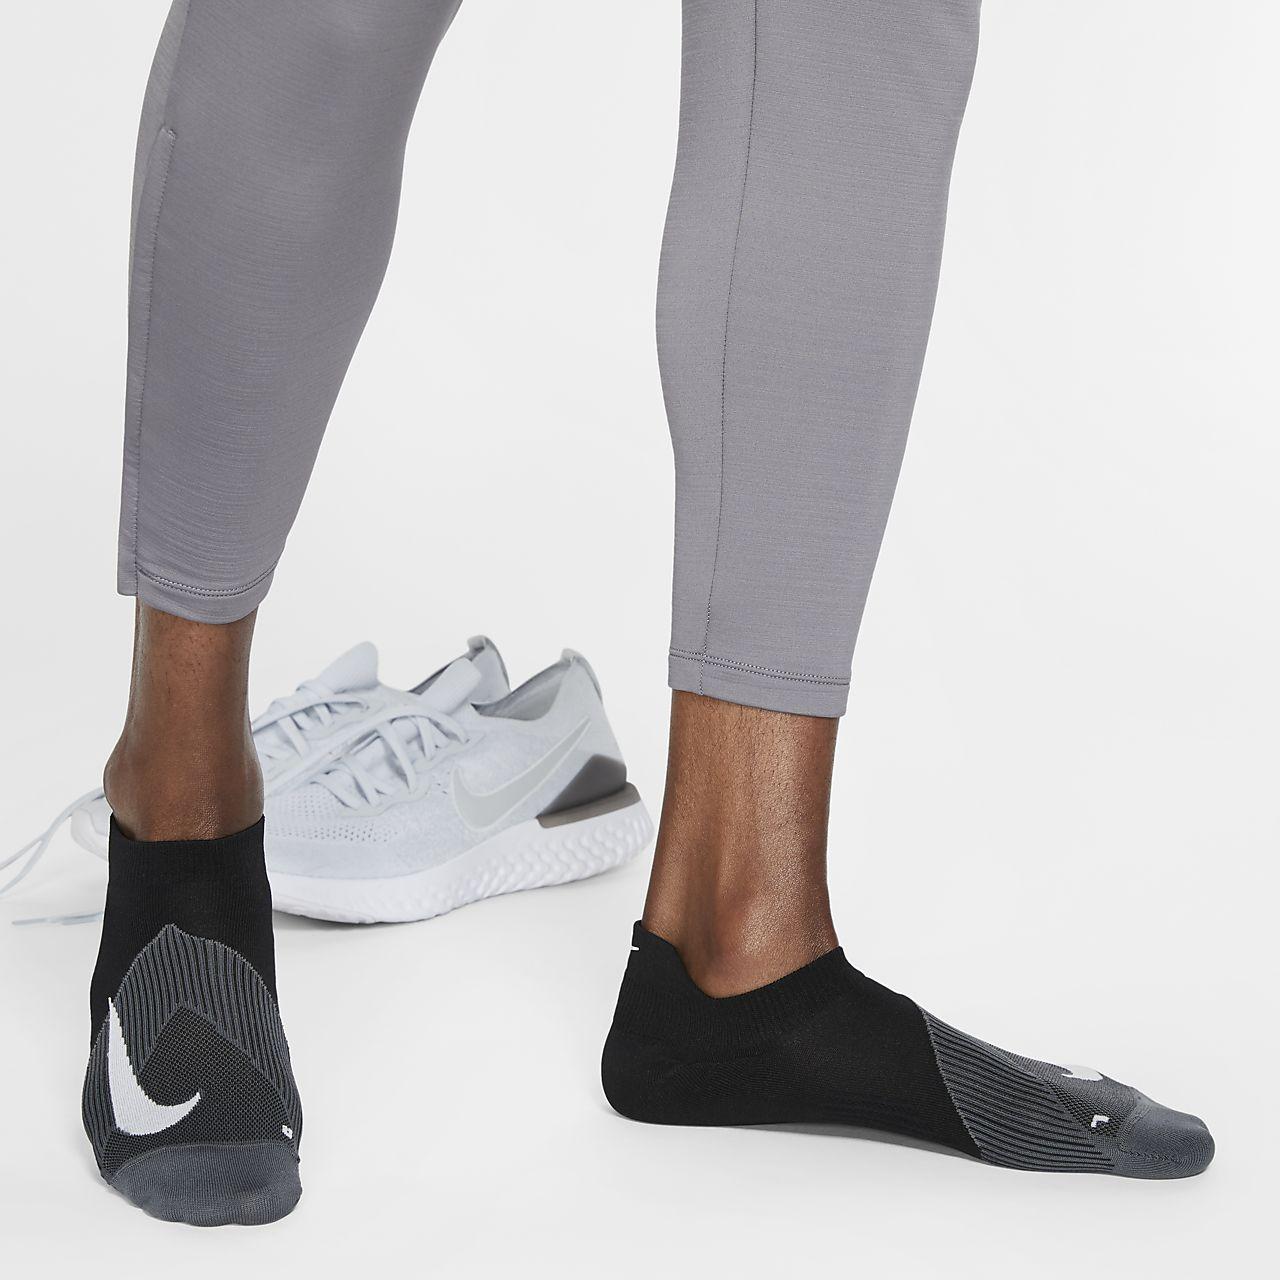 Nike Elite Lightweight No-Show Running